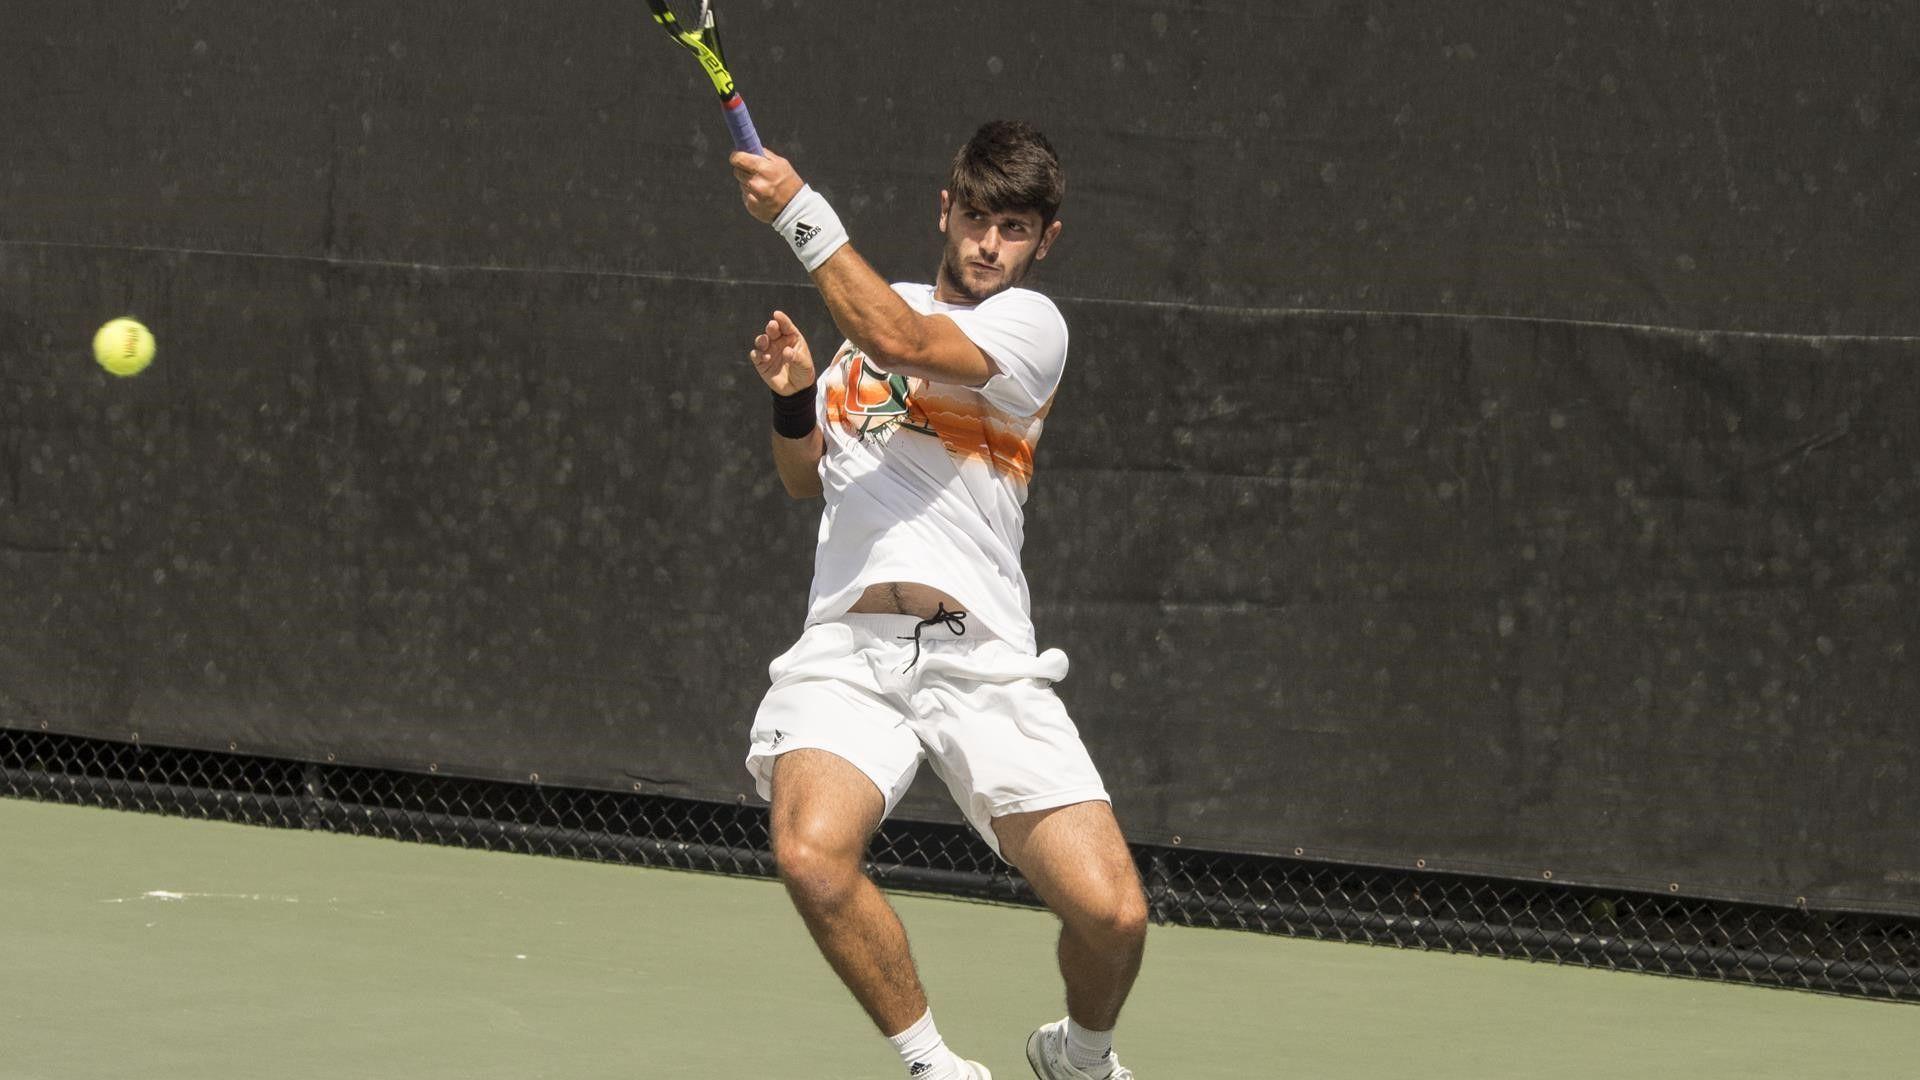 Trio Advances to ITA Southeast Regionals Quarterfinals